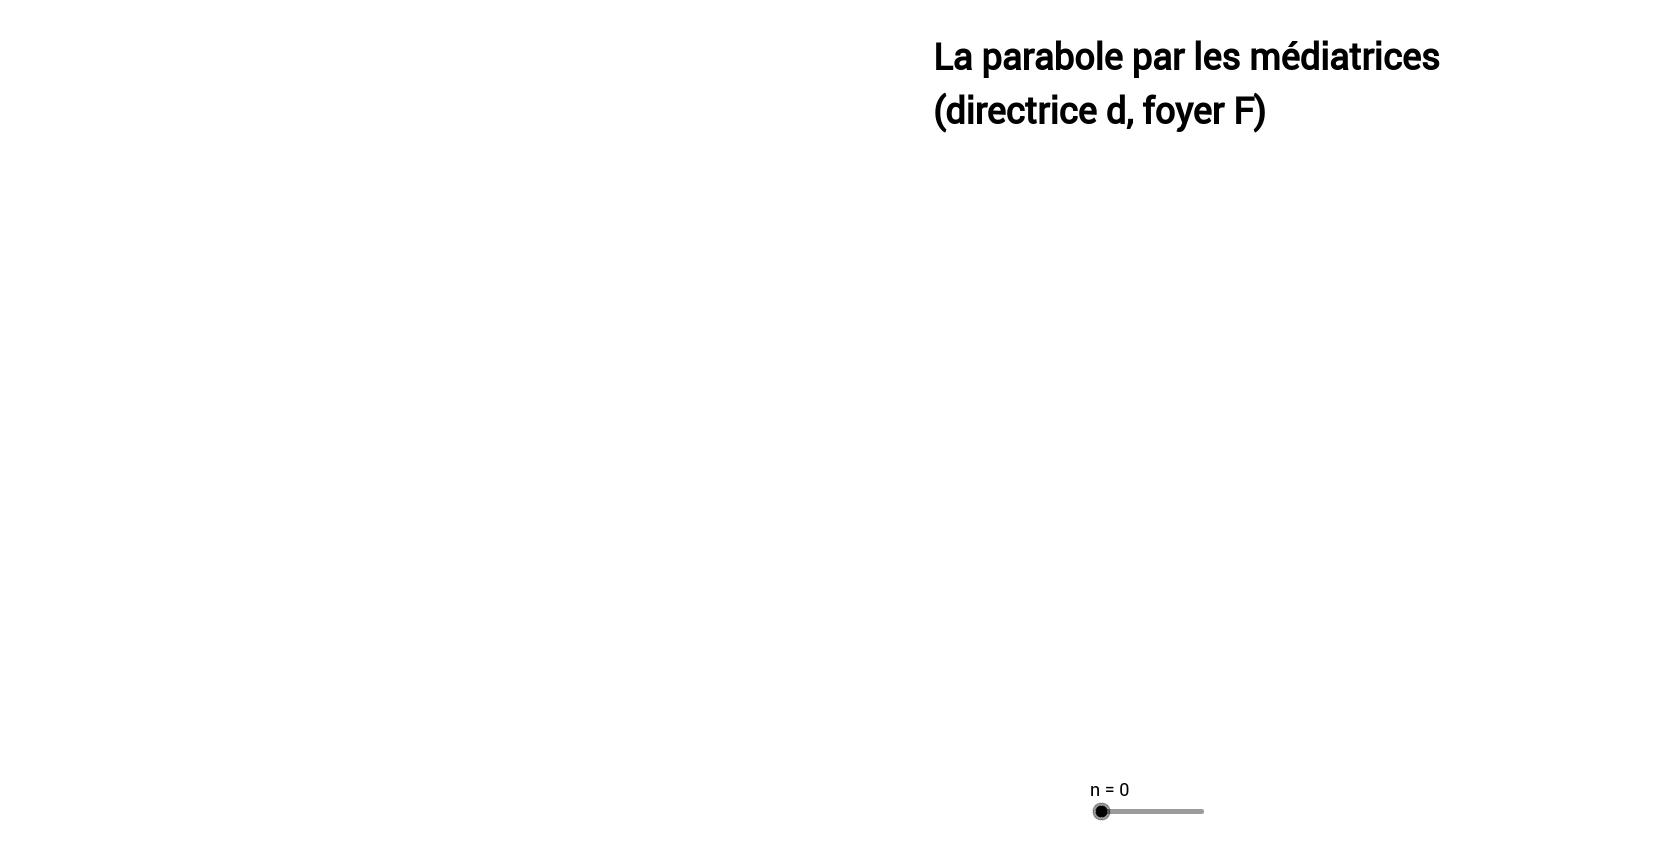 Parabole construction